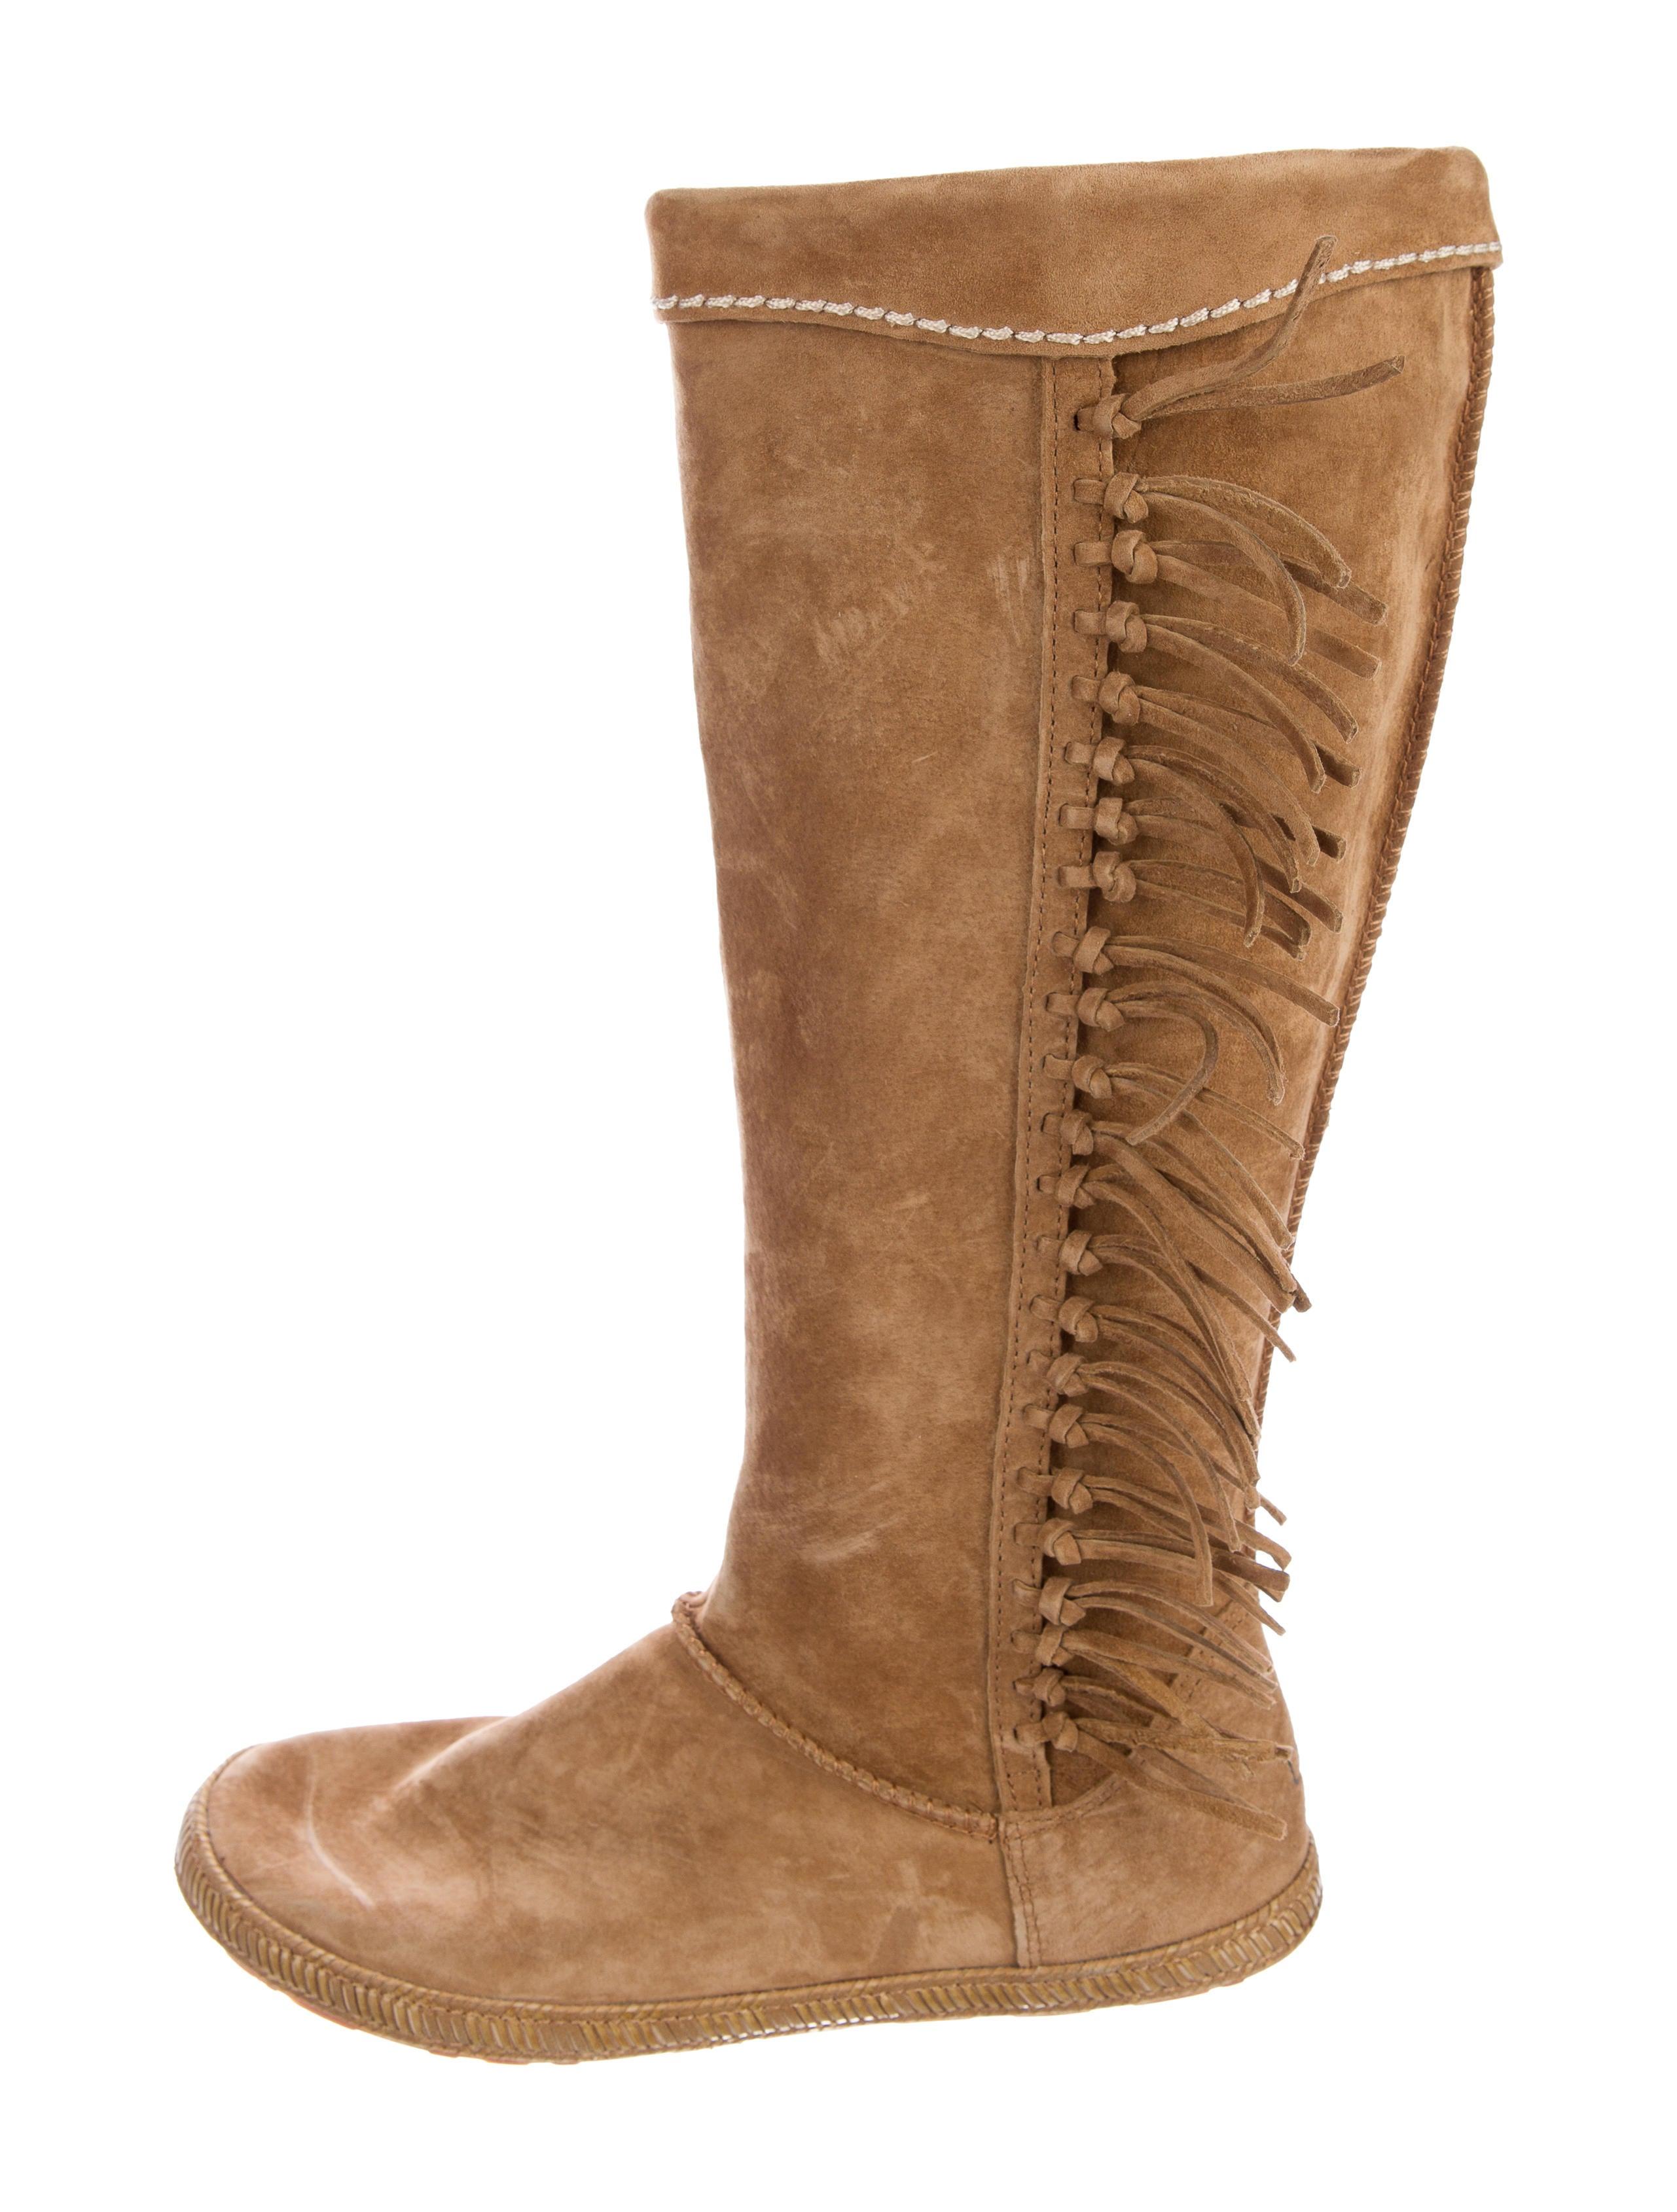 Mammoth Fringe Boots